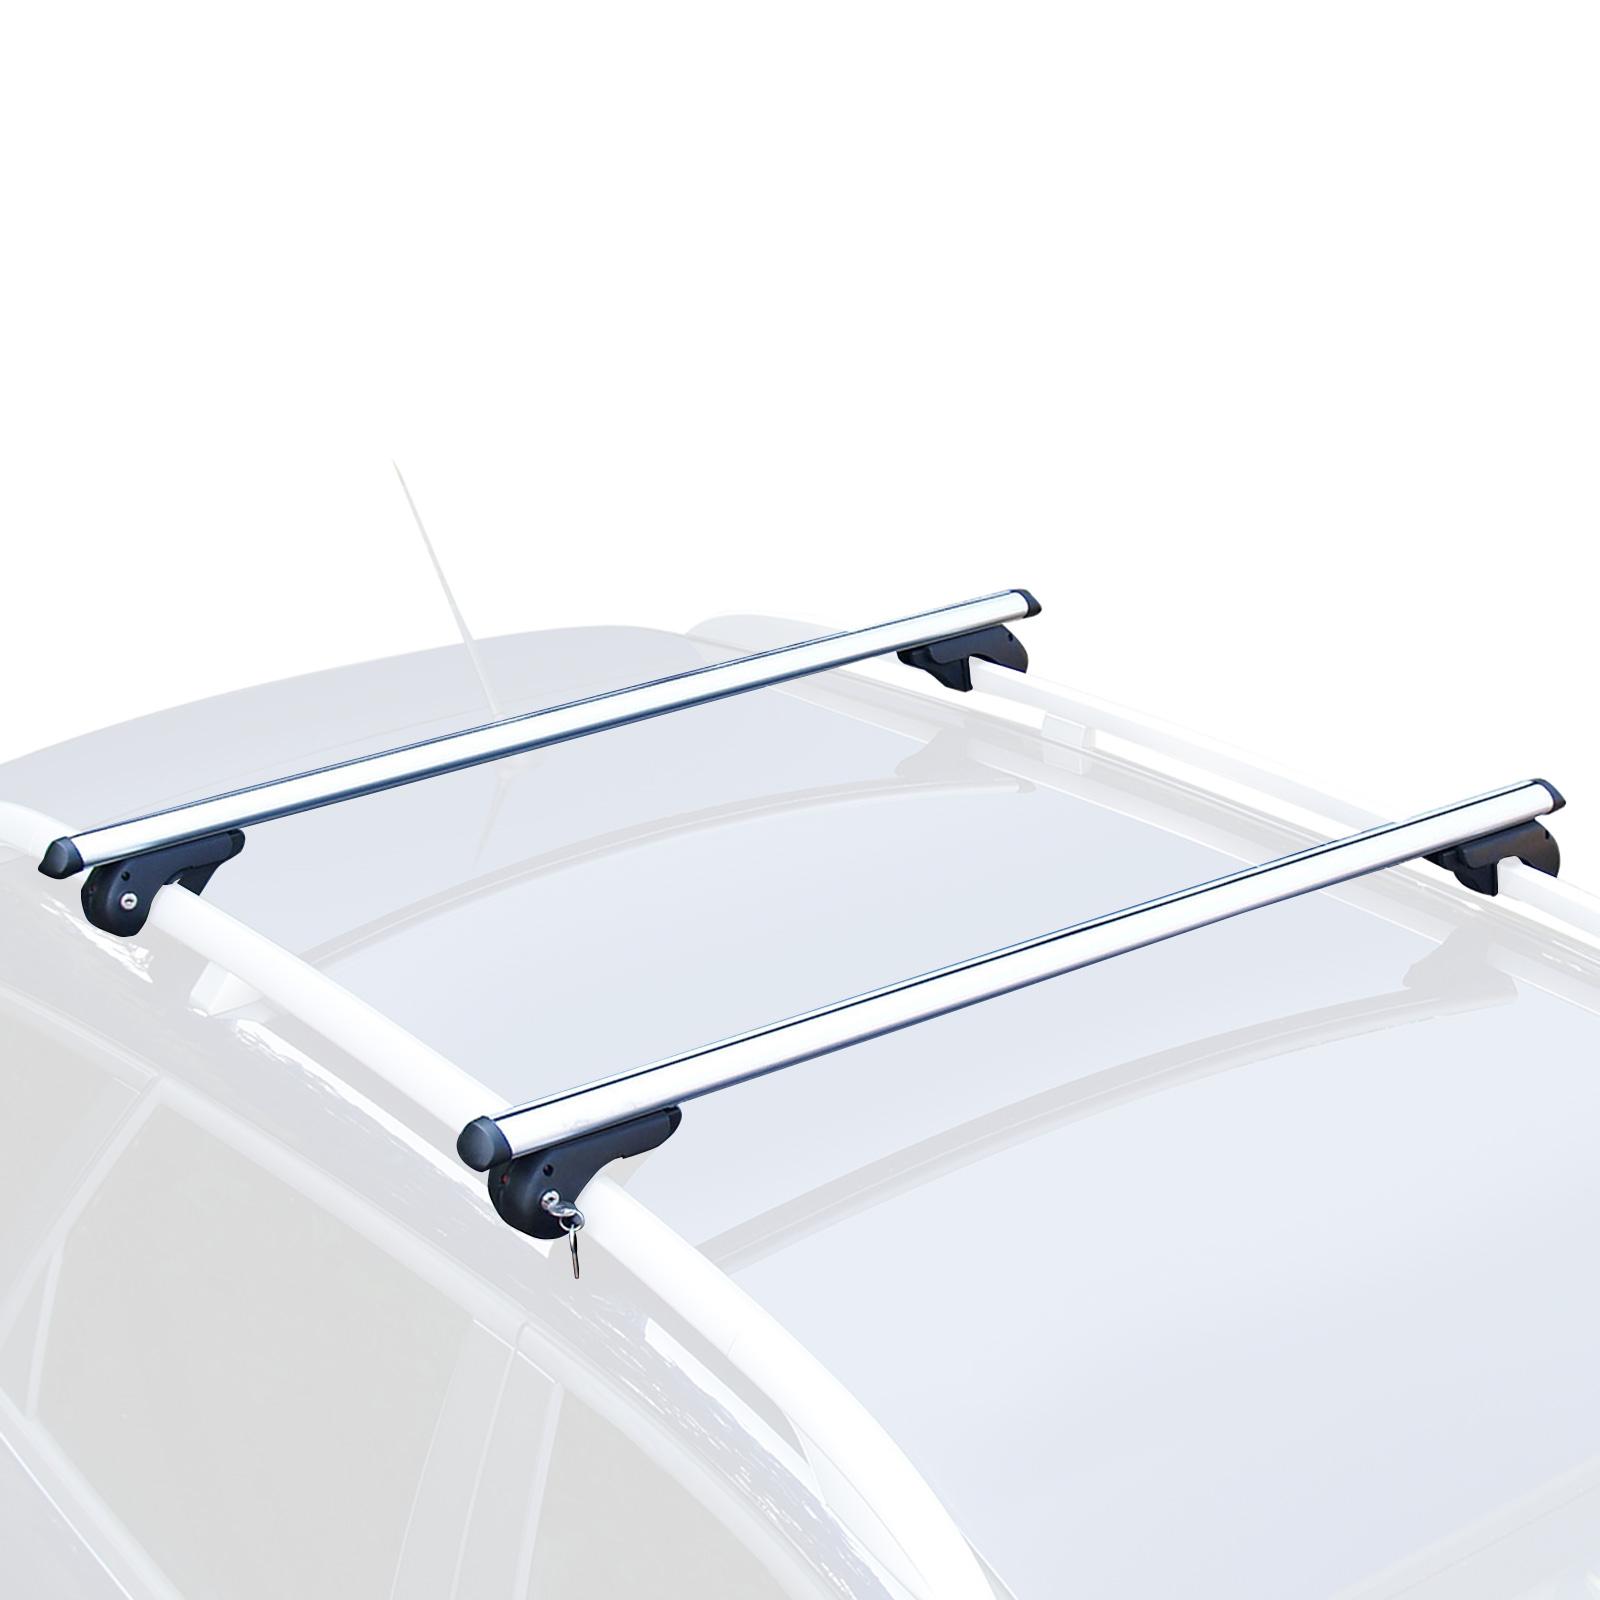 Dachrehling universal passend, 120 cm, Aluminium, max. 90 kg